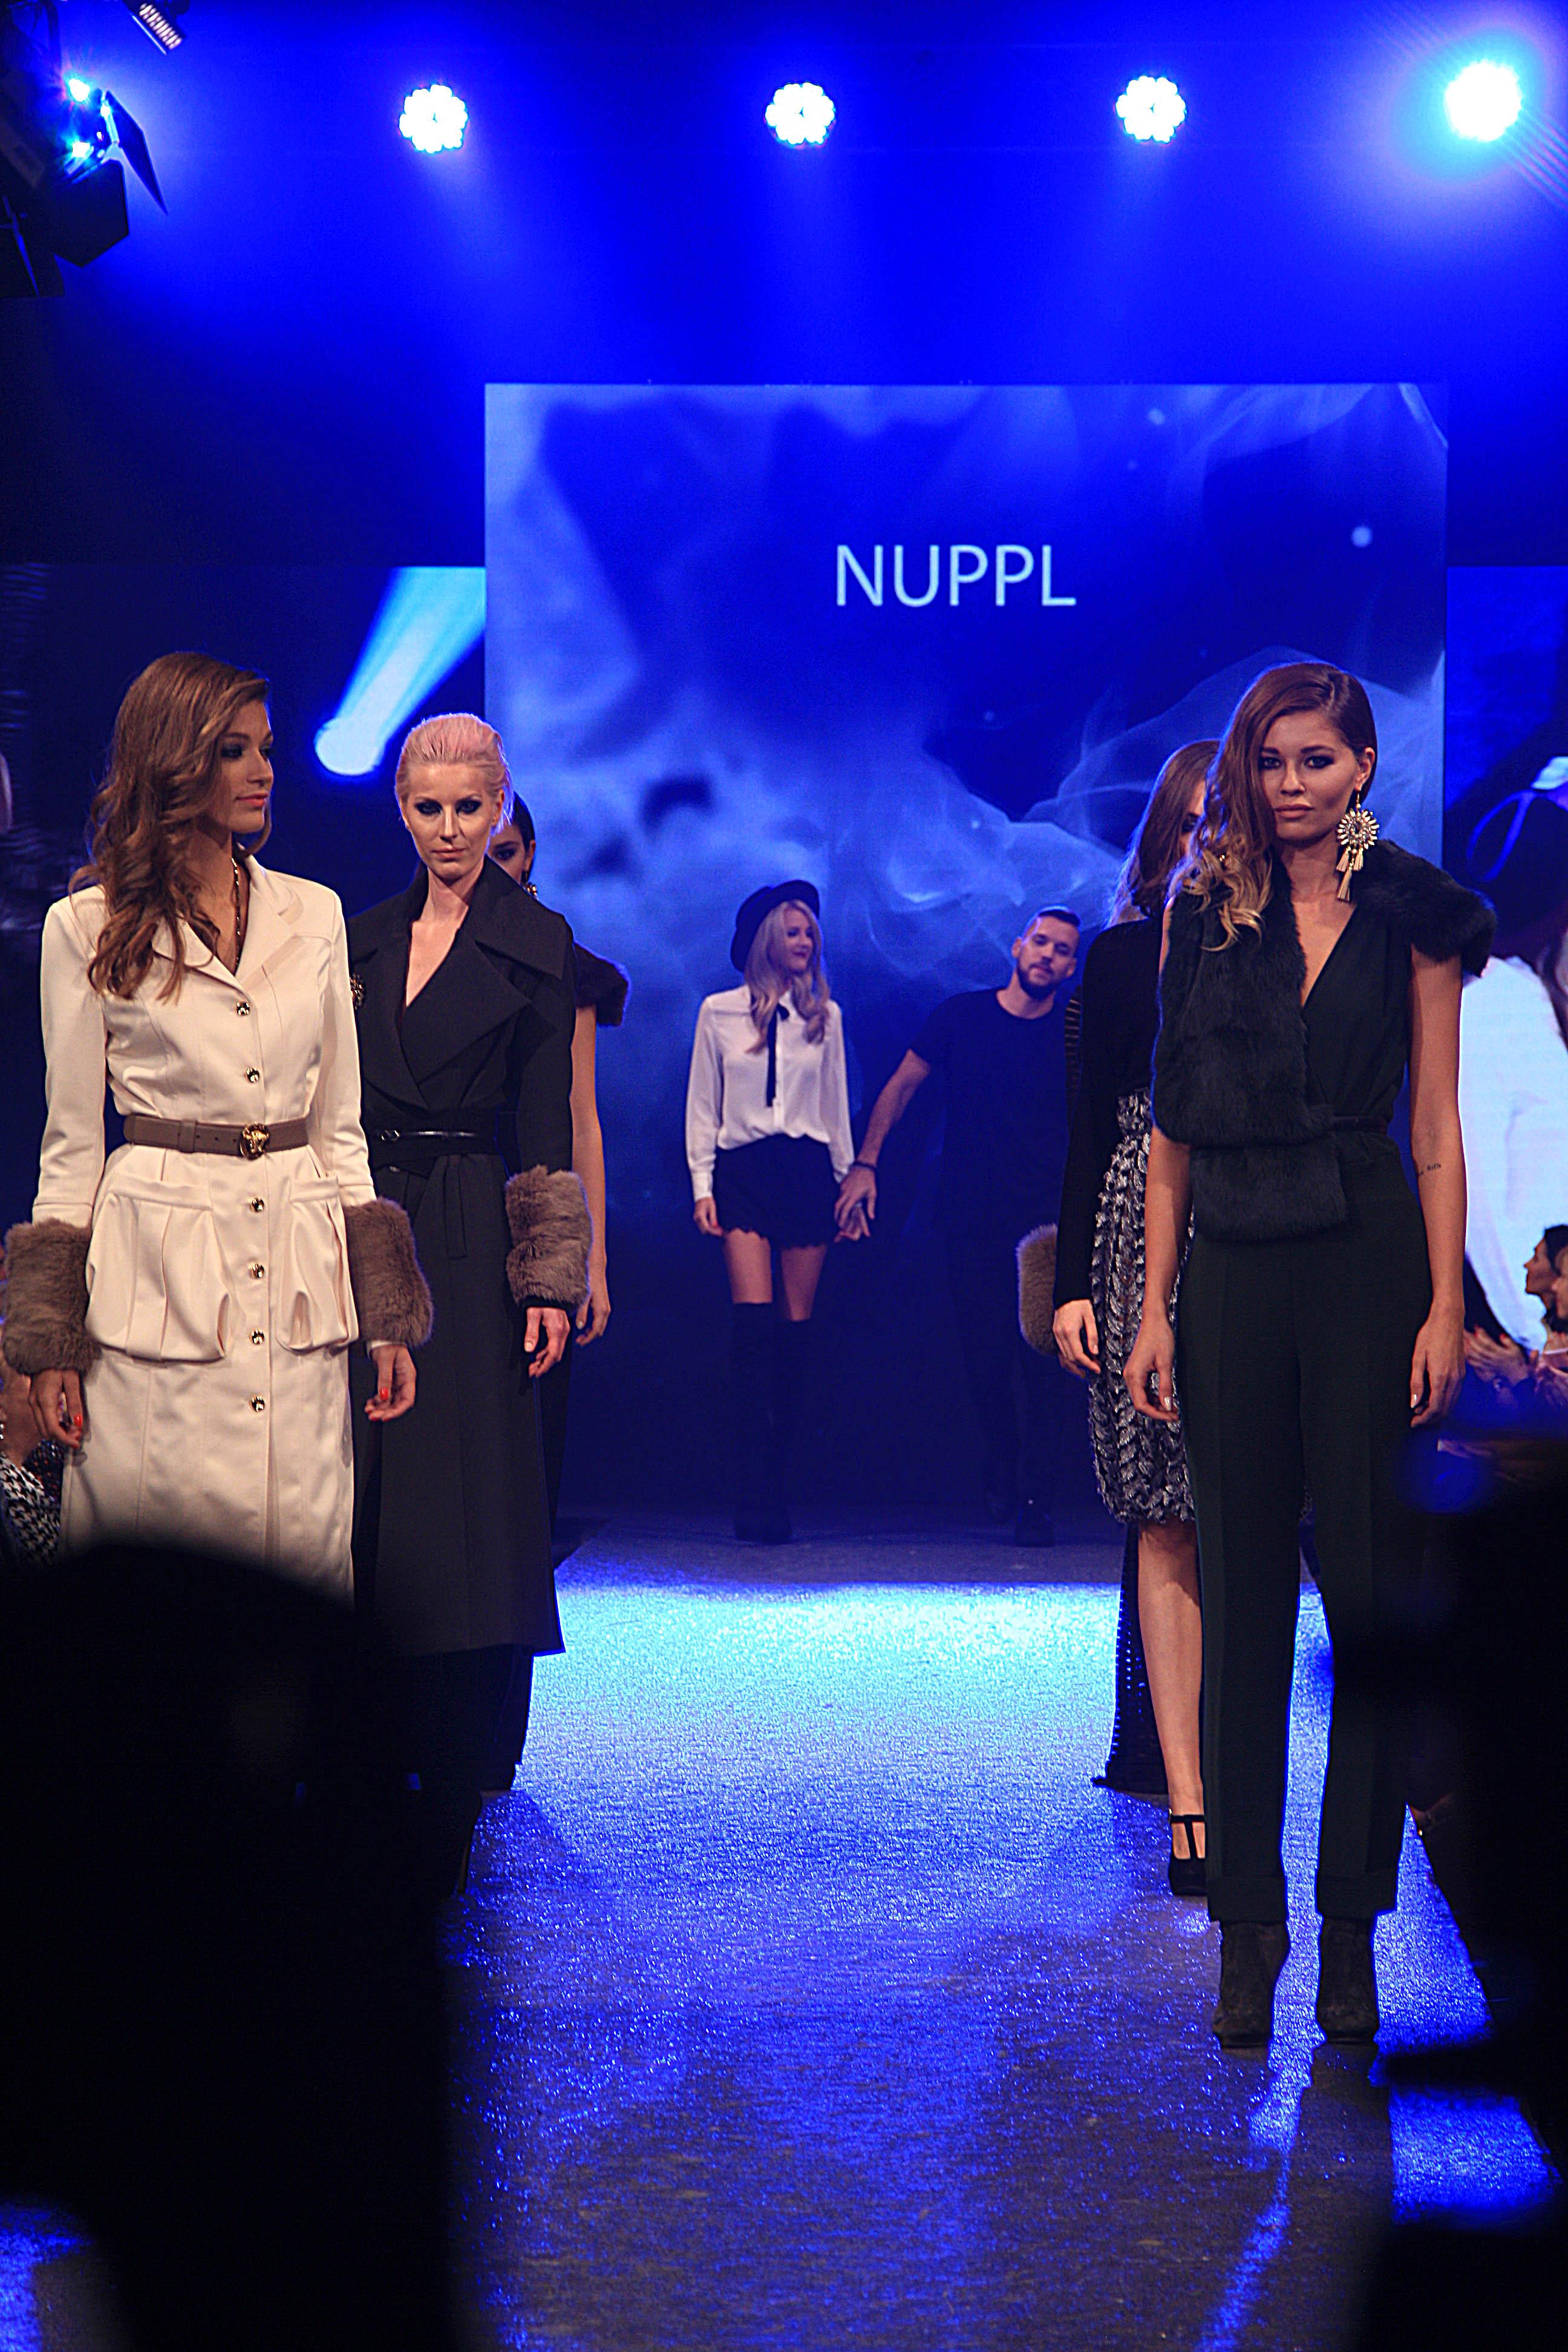 Nuppl